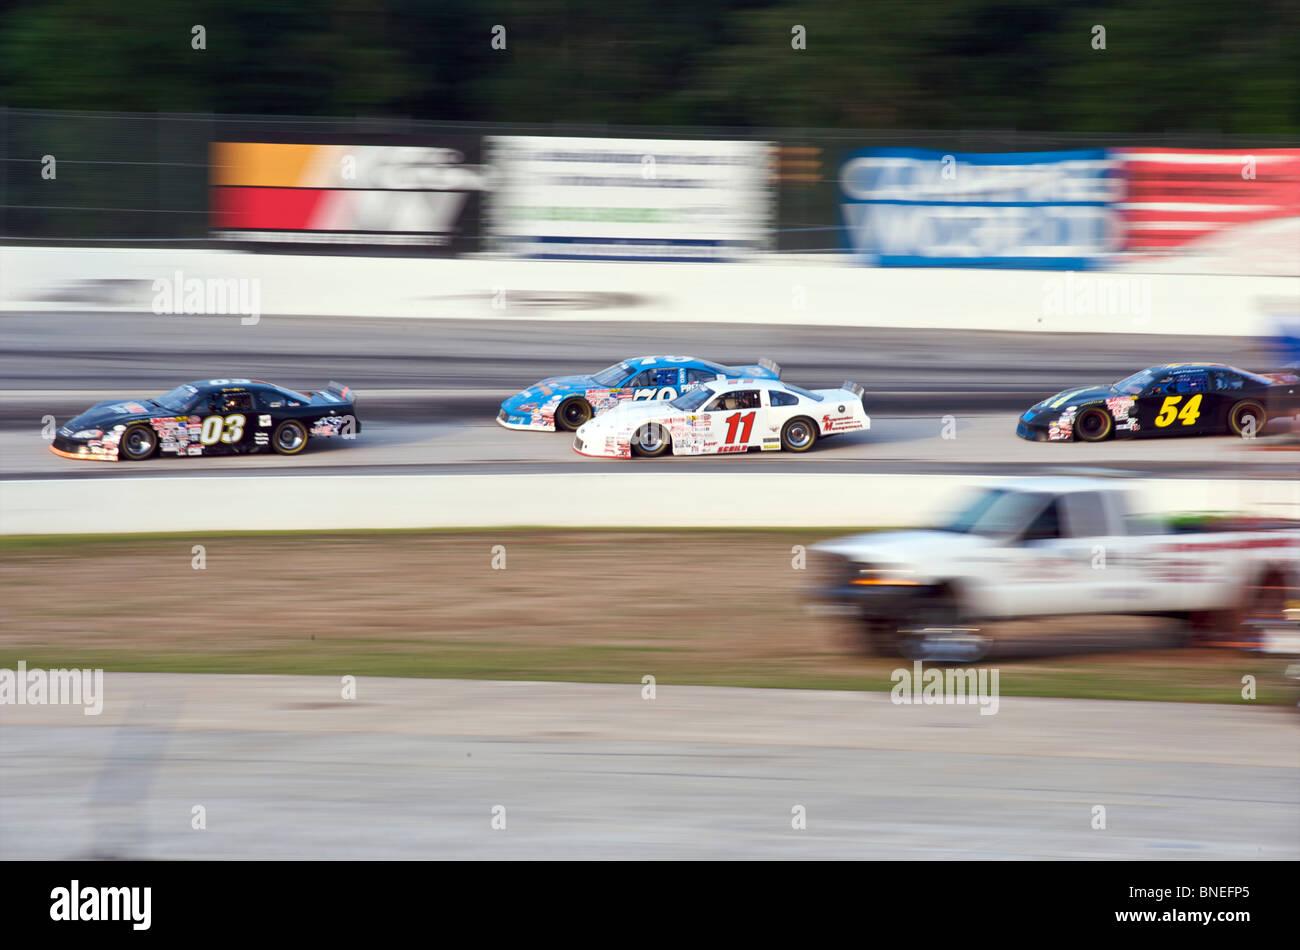 Cars racing On circuit at Nascar Racing in Houston, Texas, USA - Stock Image